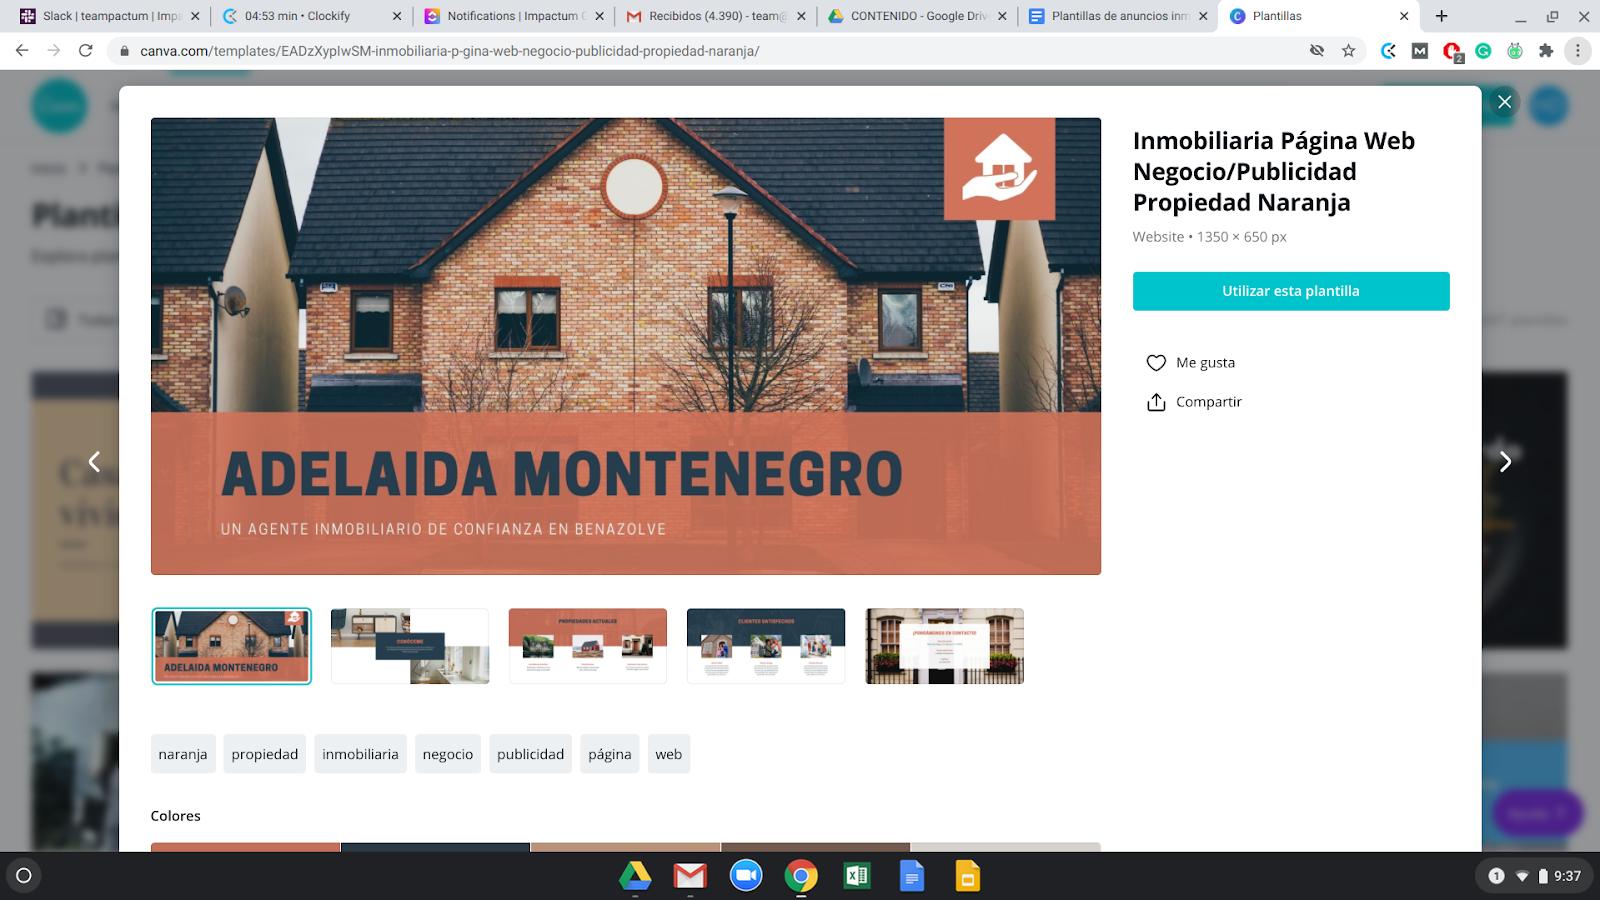 plantillas-anuncios-inmobiliarios-canva-impactum